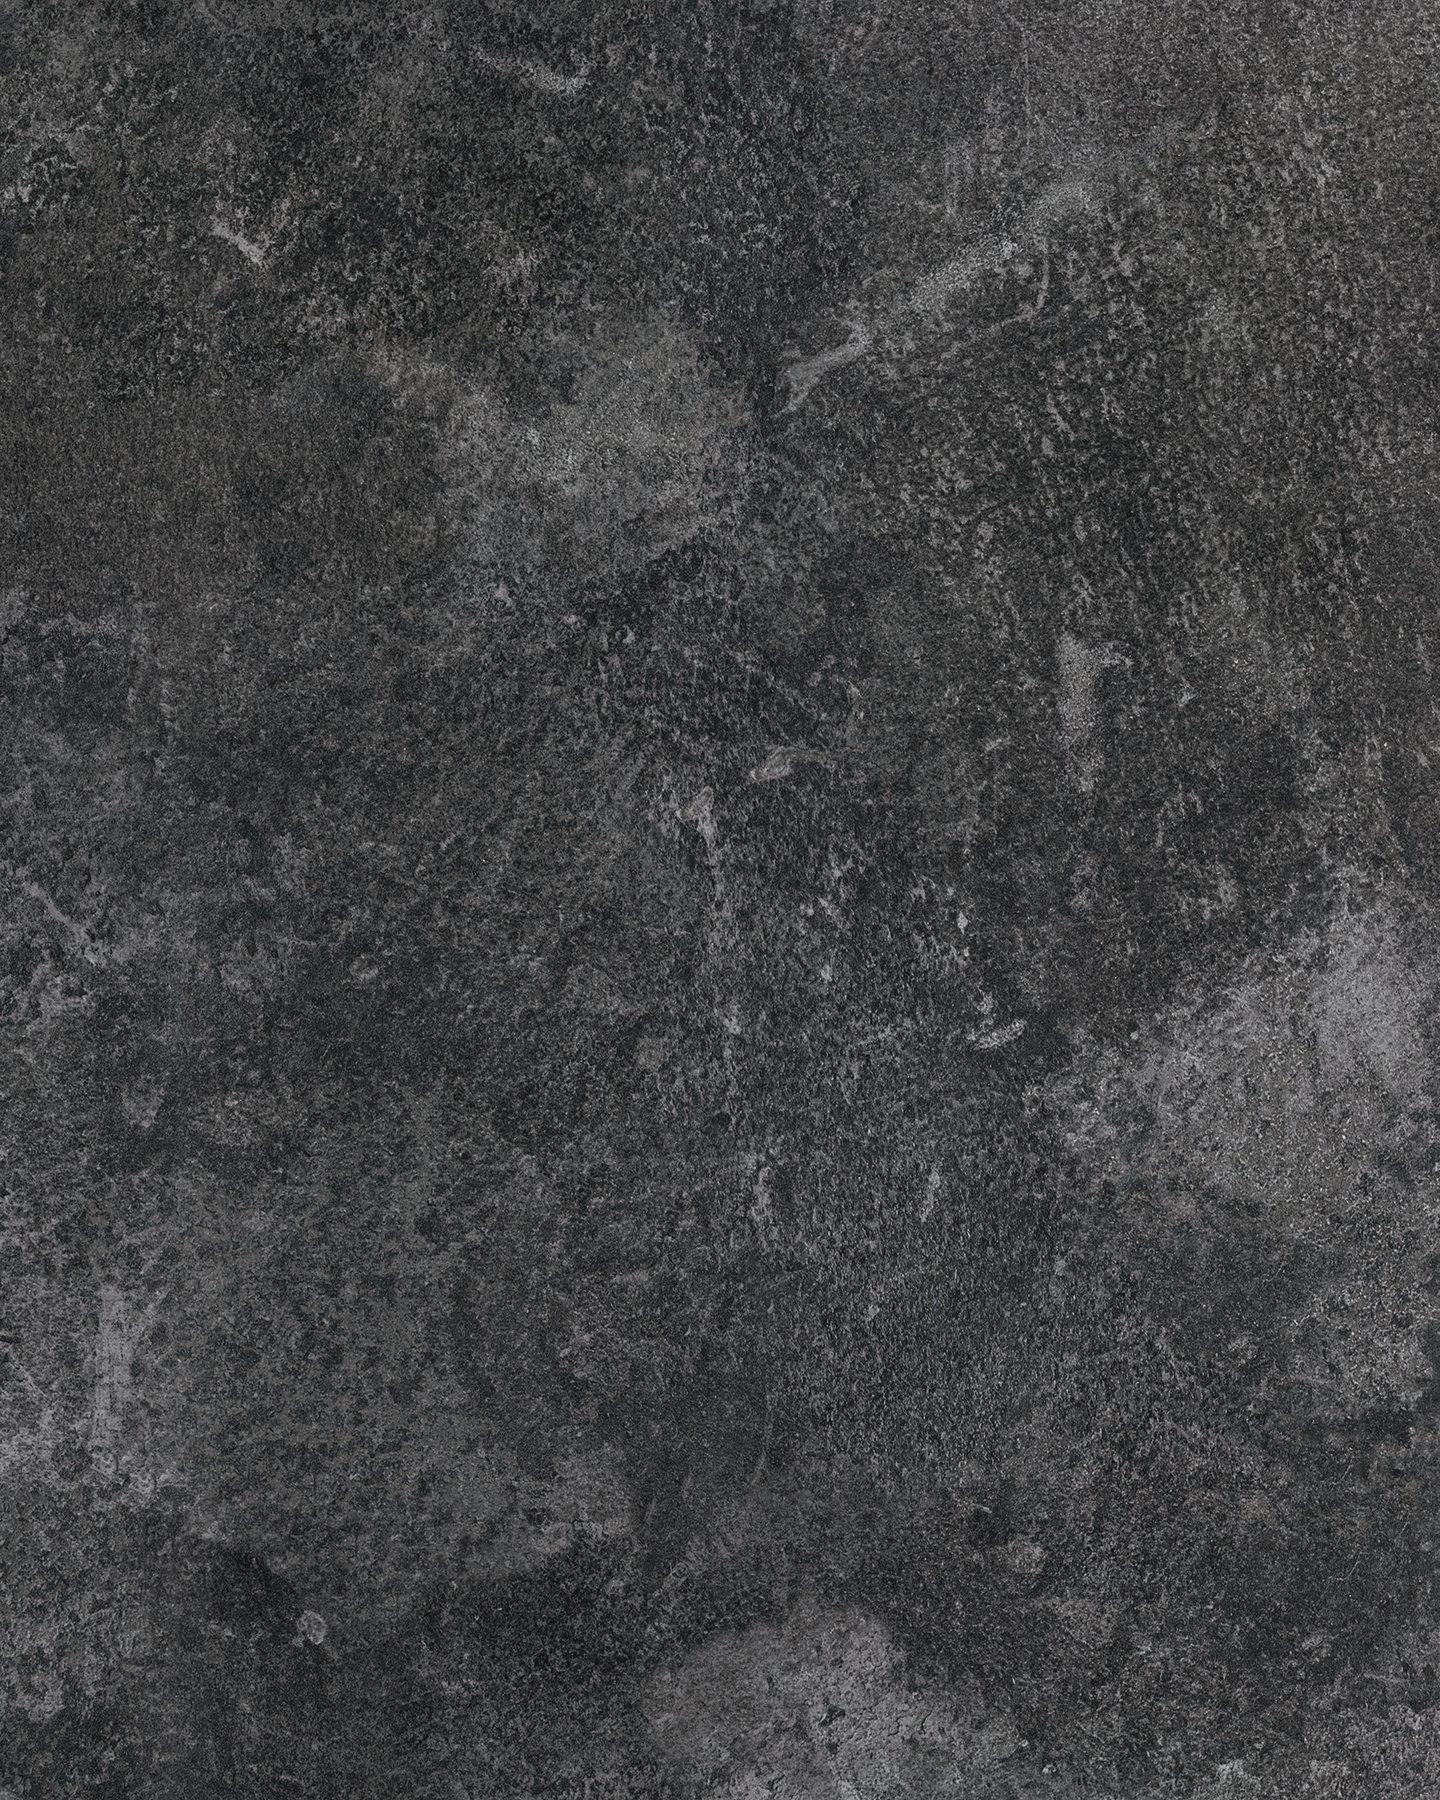 d-c-fix Self-Adhesive Film, Slate Grey, 17.71'' x 59'' Roll, 346-0583